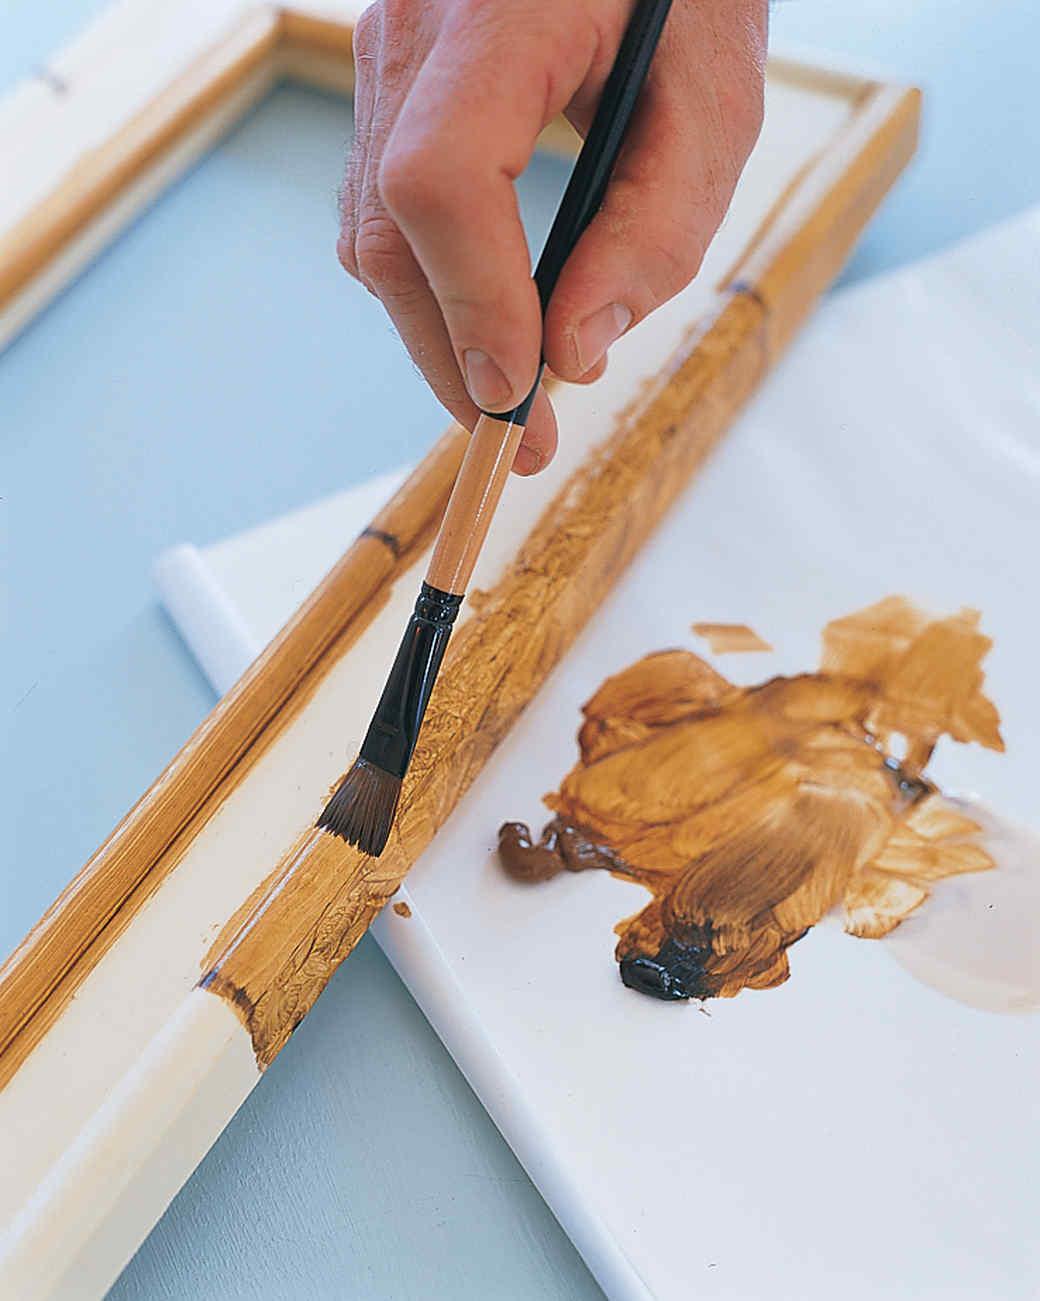 11 DIY Woodworking Hacks from the Pros| DIY Home, Woodworking Projects, Woodworking Plans, Woodworking Plans, Woodworking Tools, DIY Crafts, Craft Hacks, Craft Hacks DIY